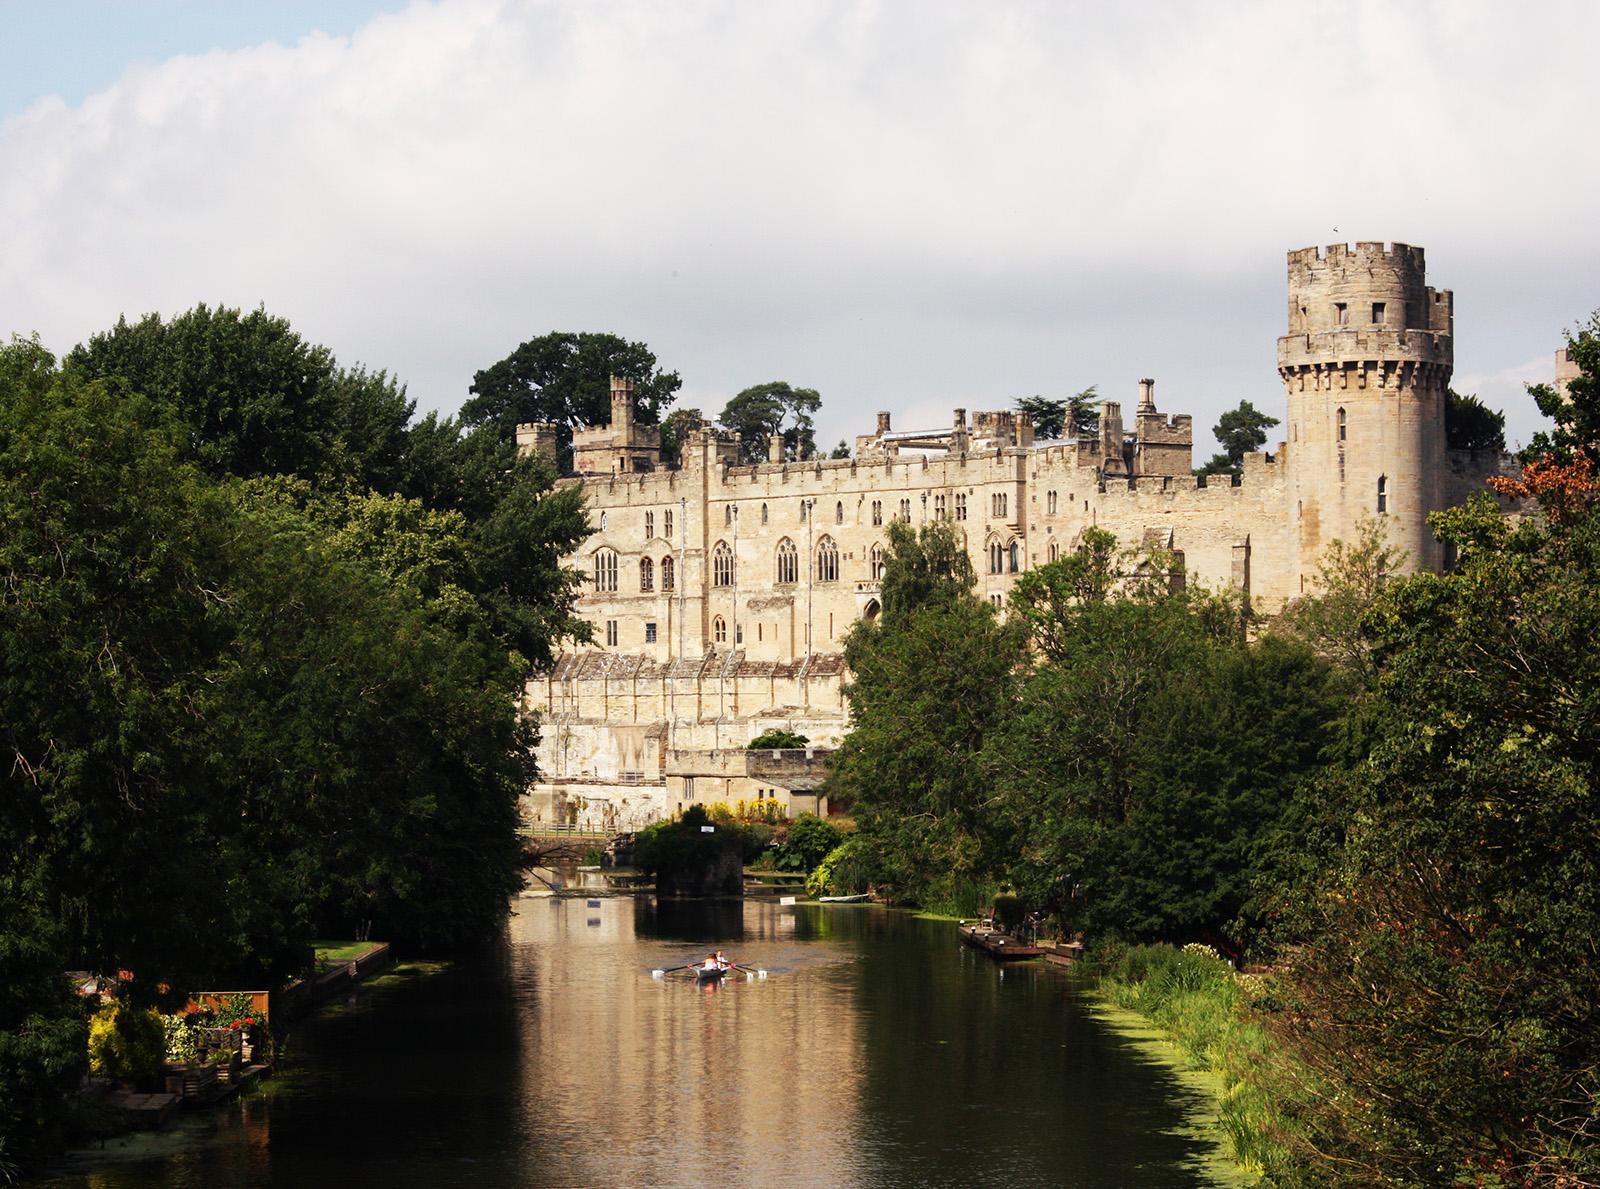 Peter Grimbly – Warwick Castle